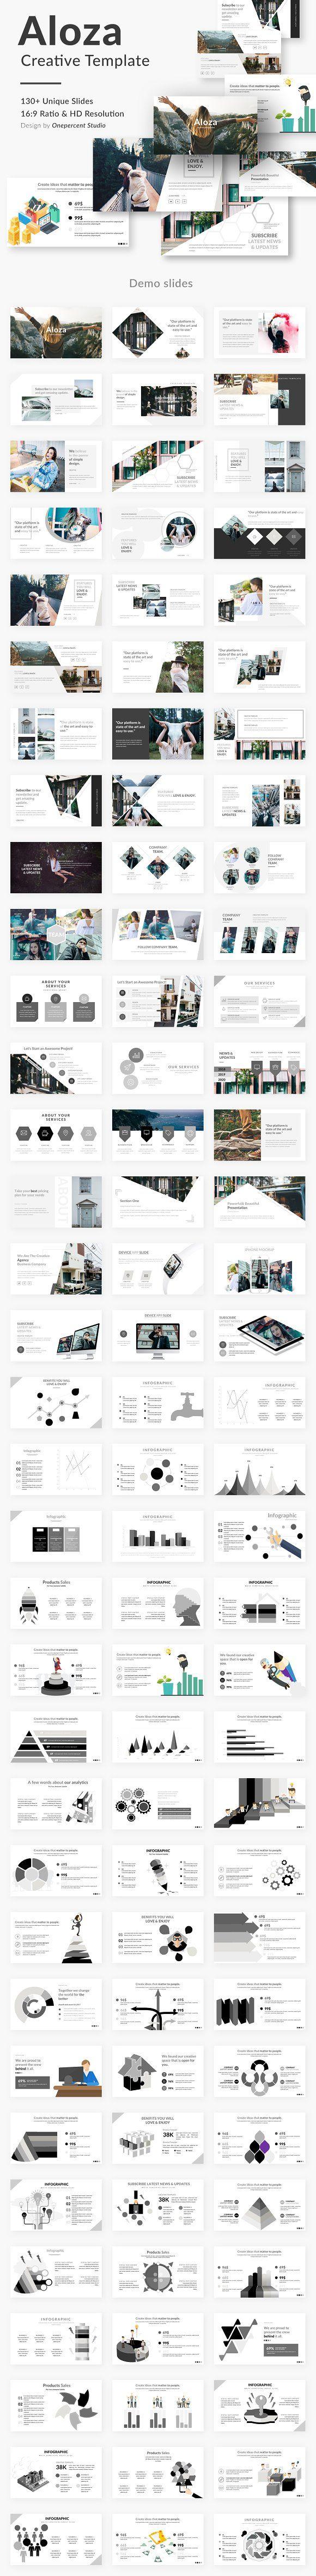 aloza creative google slide template by one percent studio on